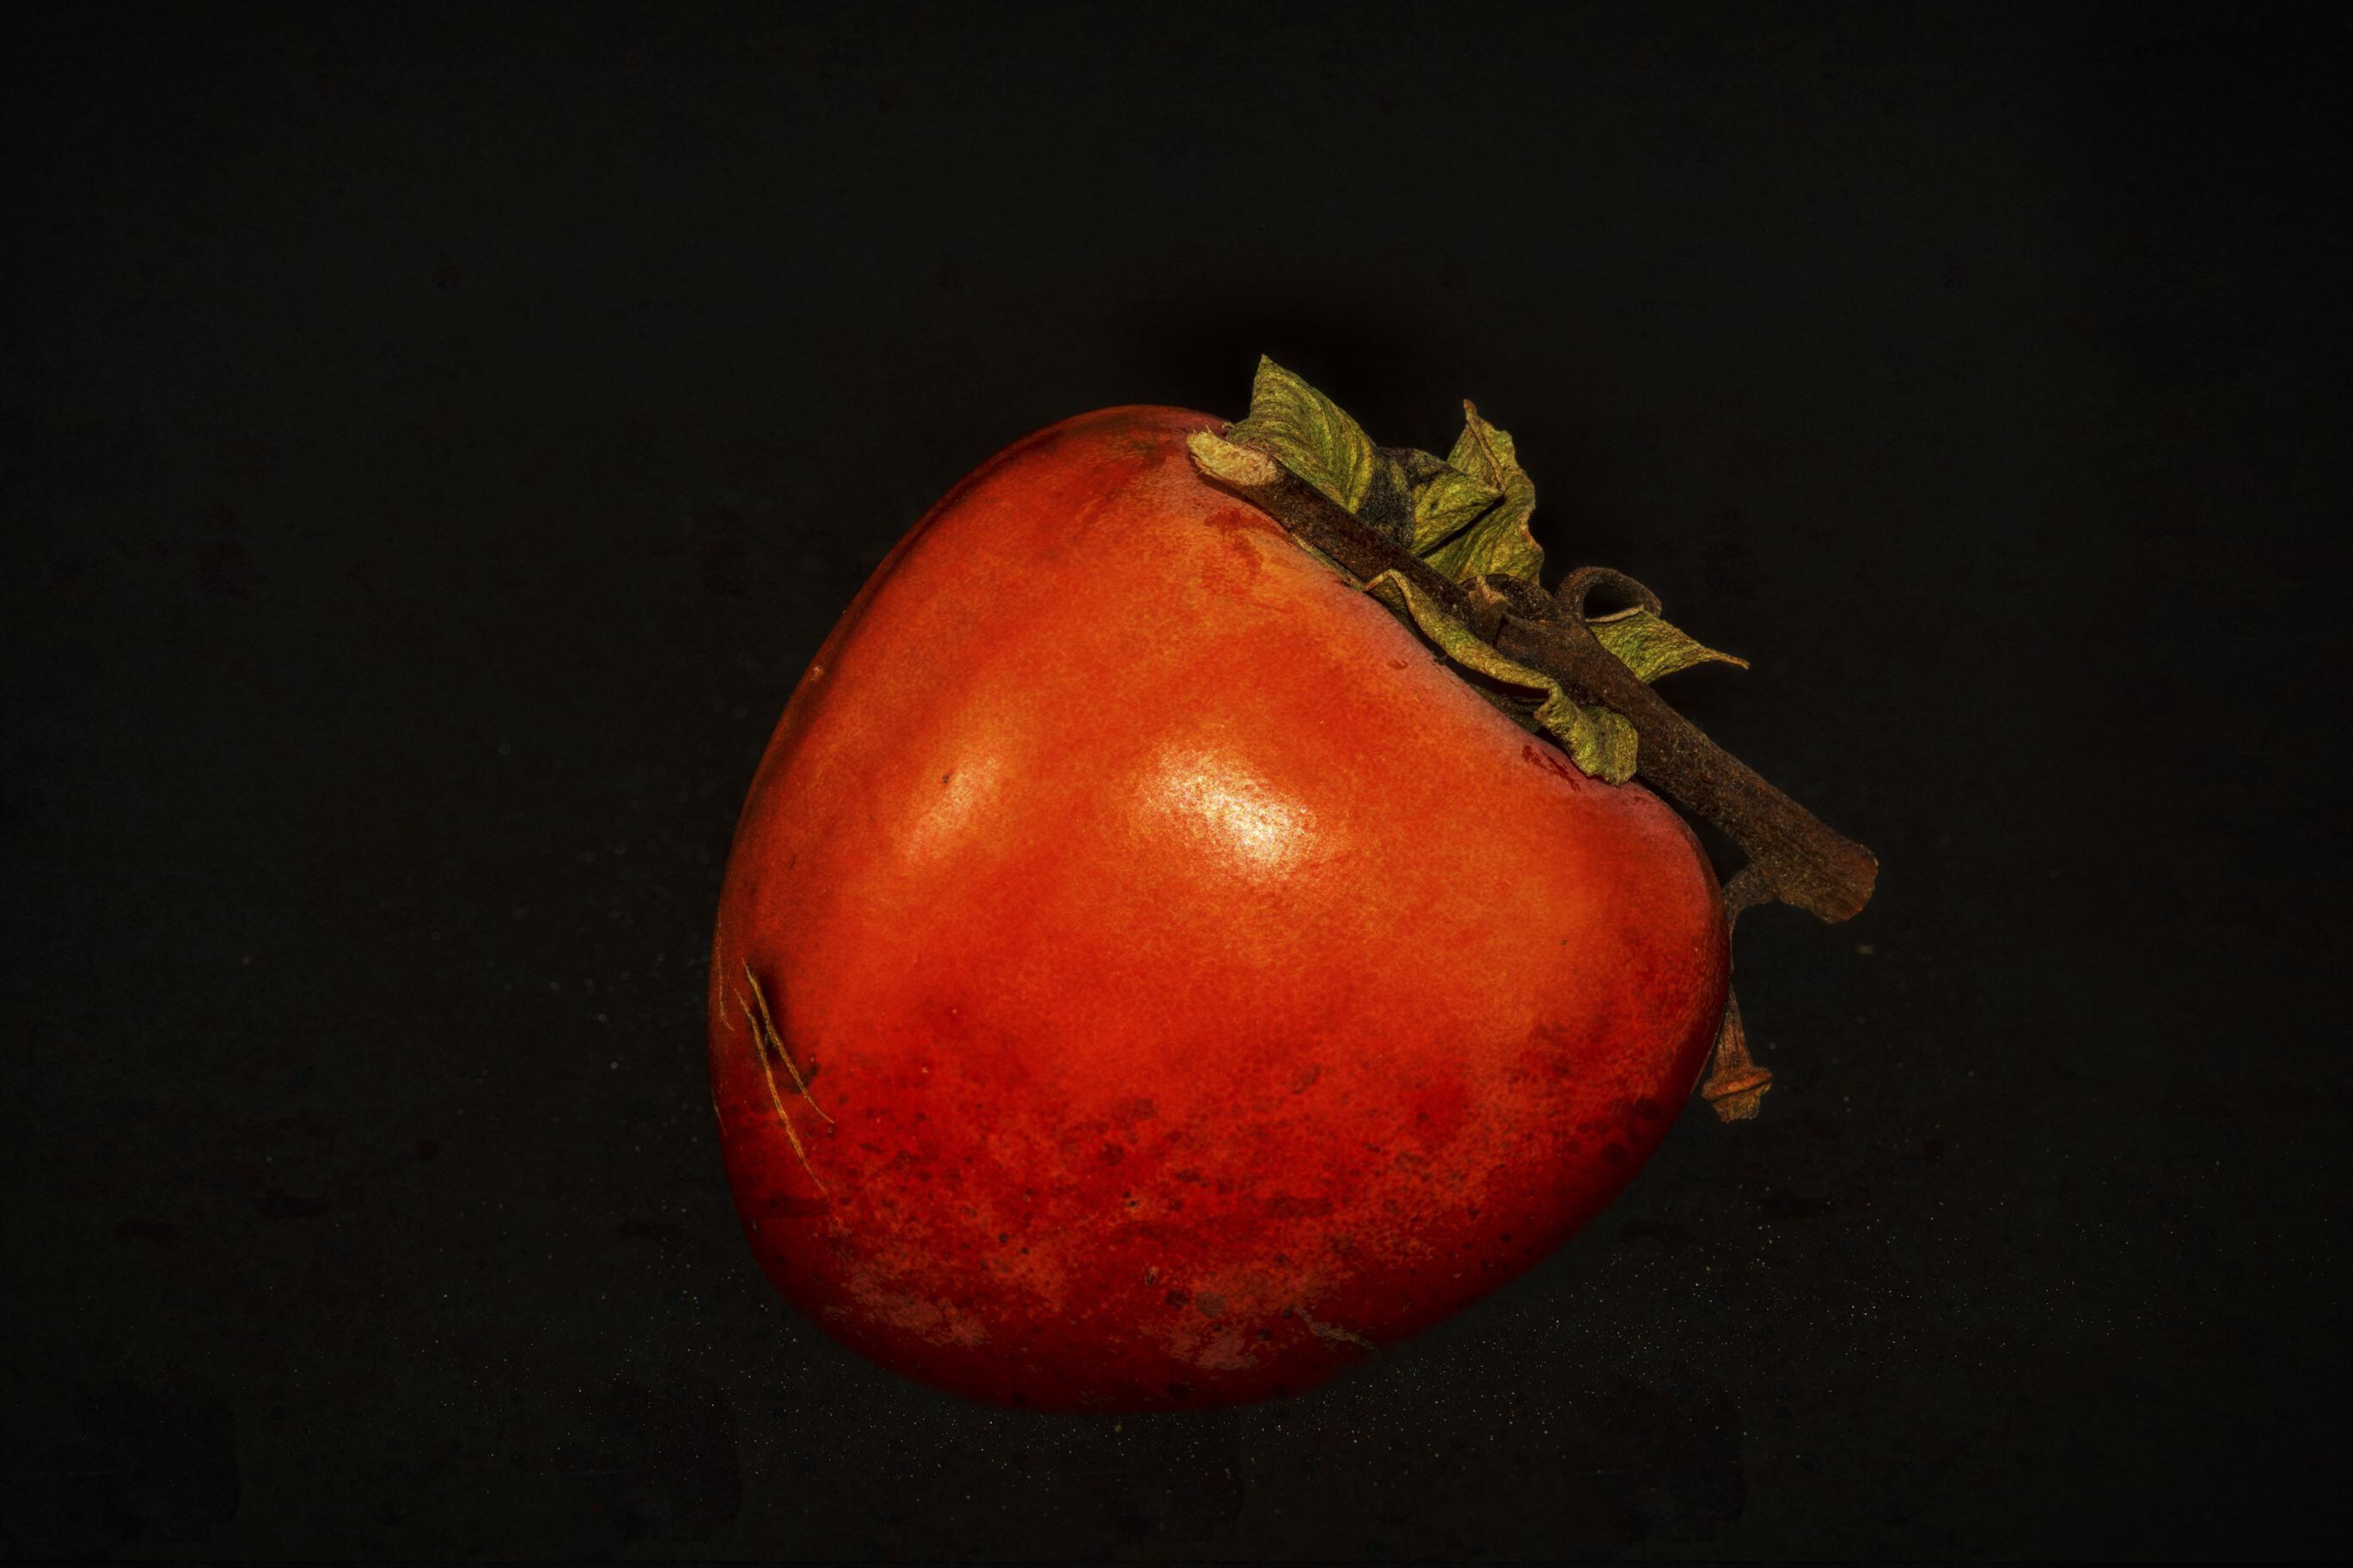 persimmon-8330-Edit